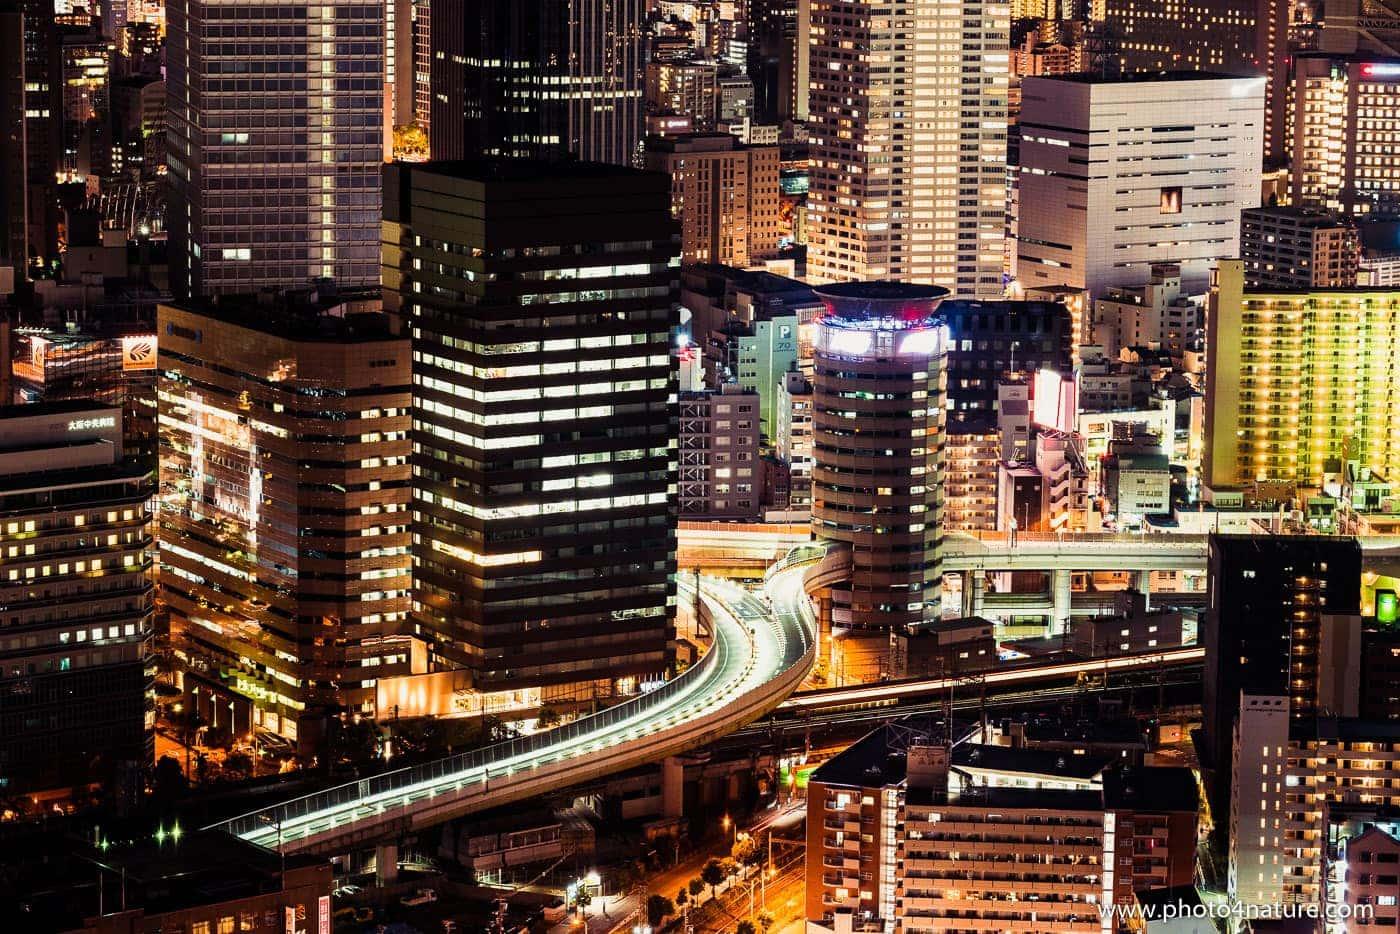 Traffic Nightscape Osaka   FE 70-200 f2.8 GM @ 2 sec, f8